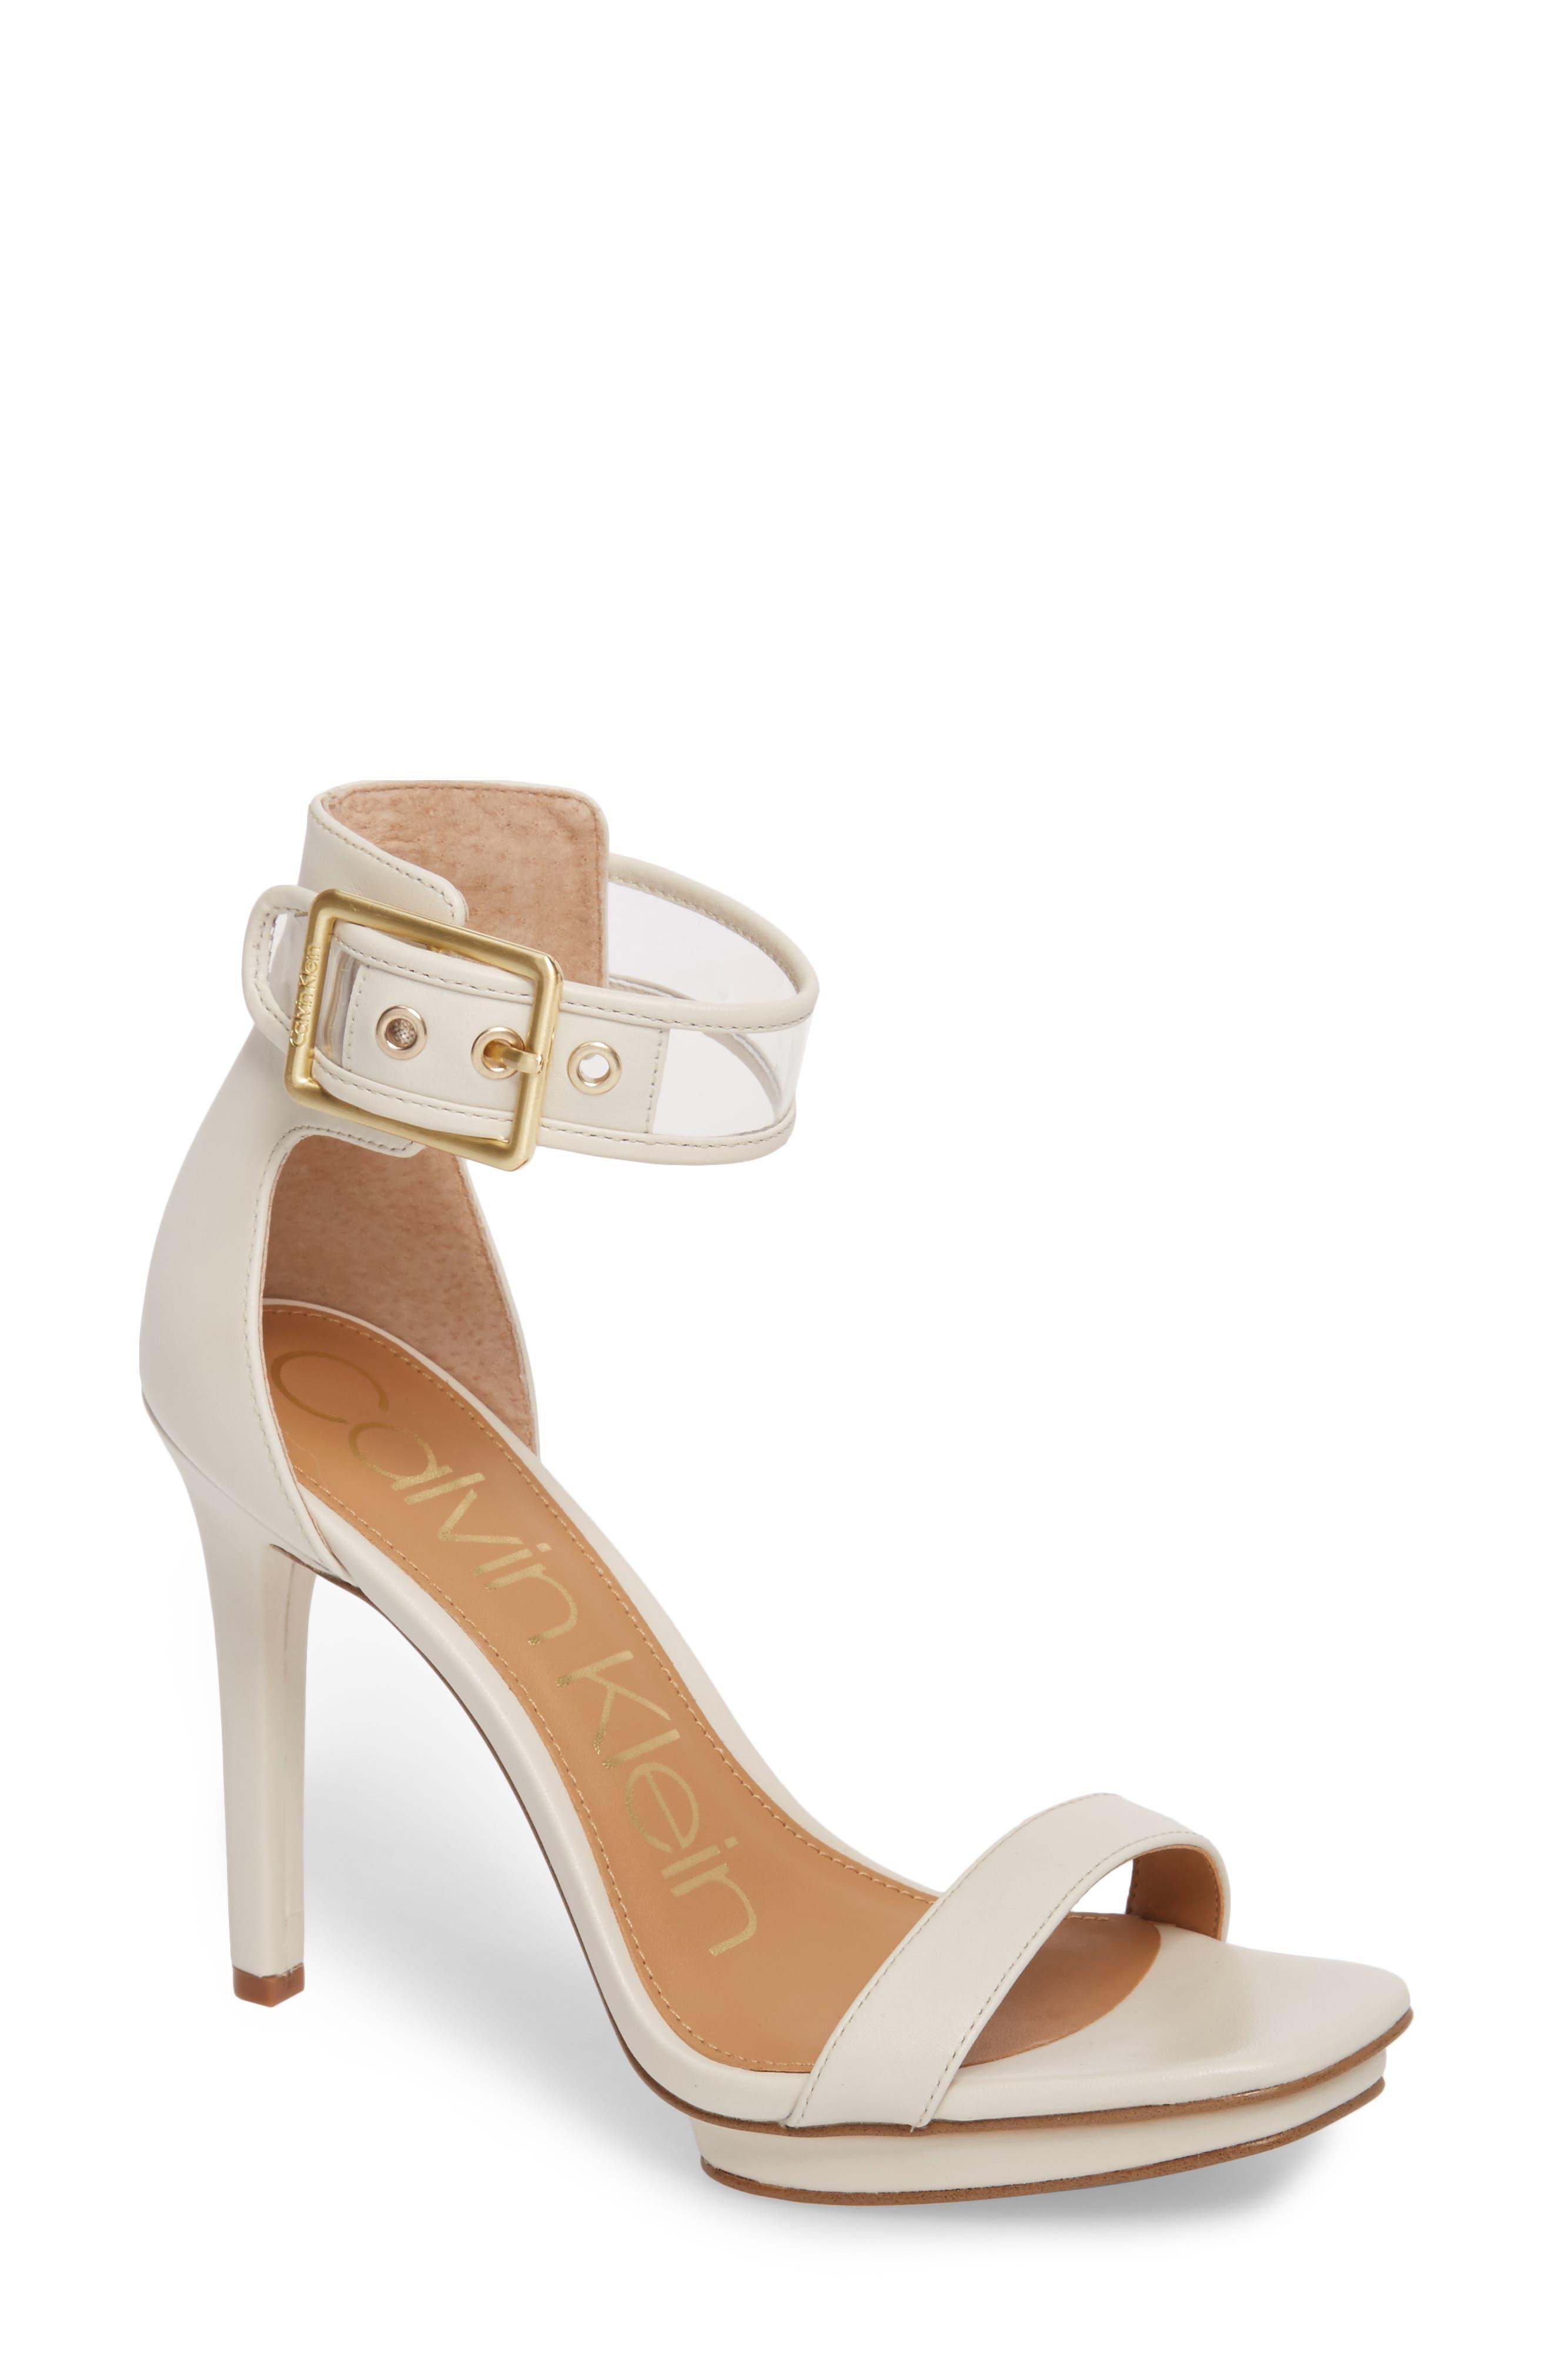 Vable Sandal,                             Main thumbnail 1, color,                             Soft White Leather